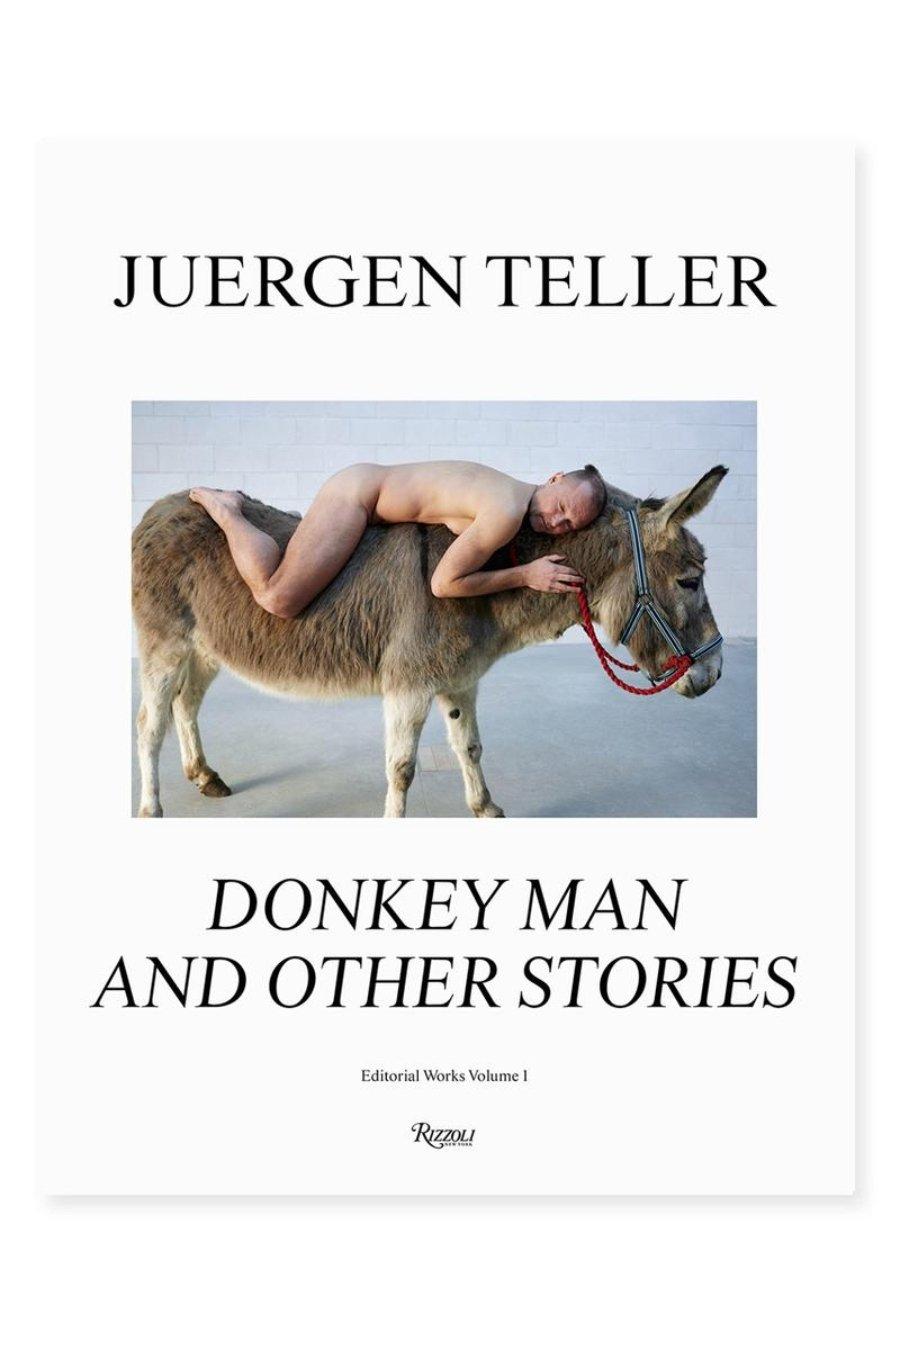 Fotografía de Juergen Teller